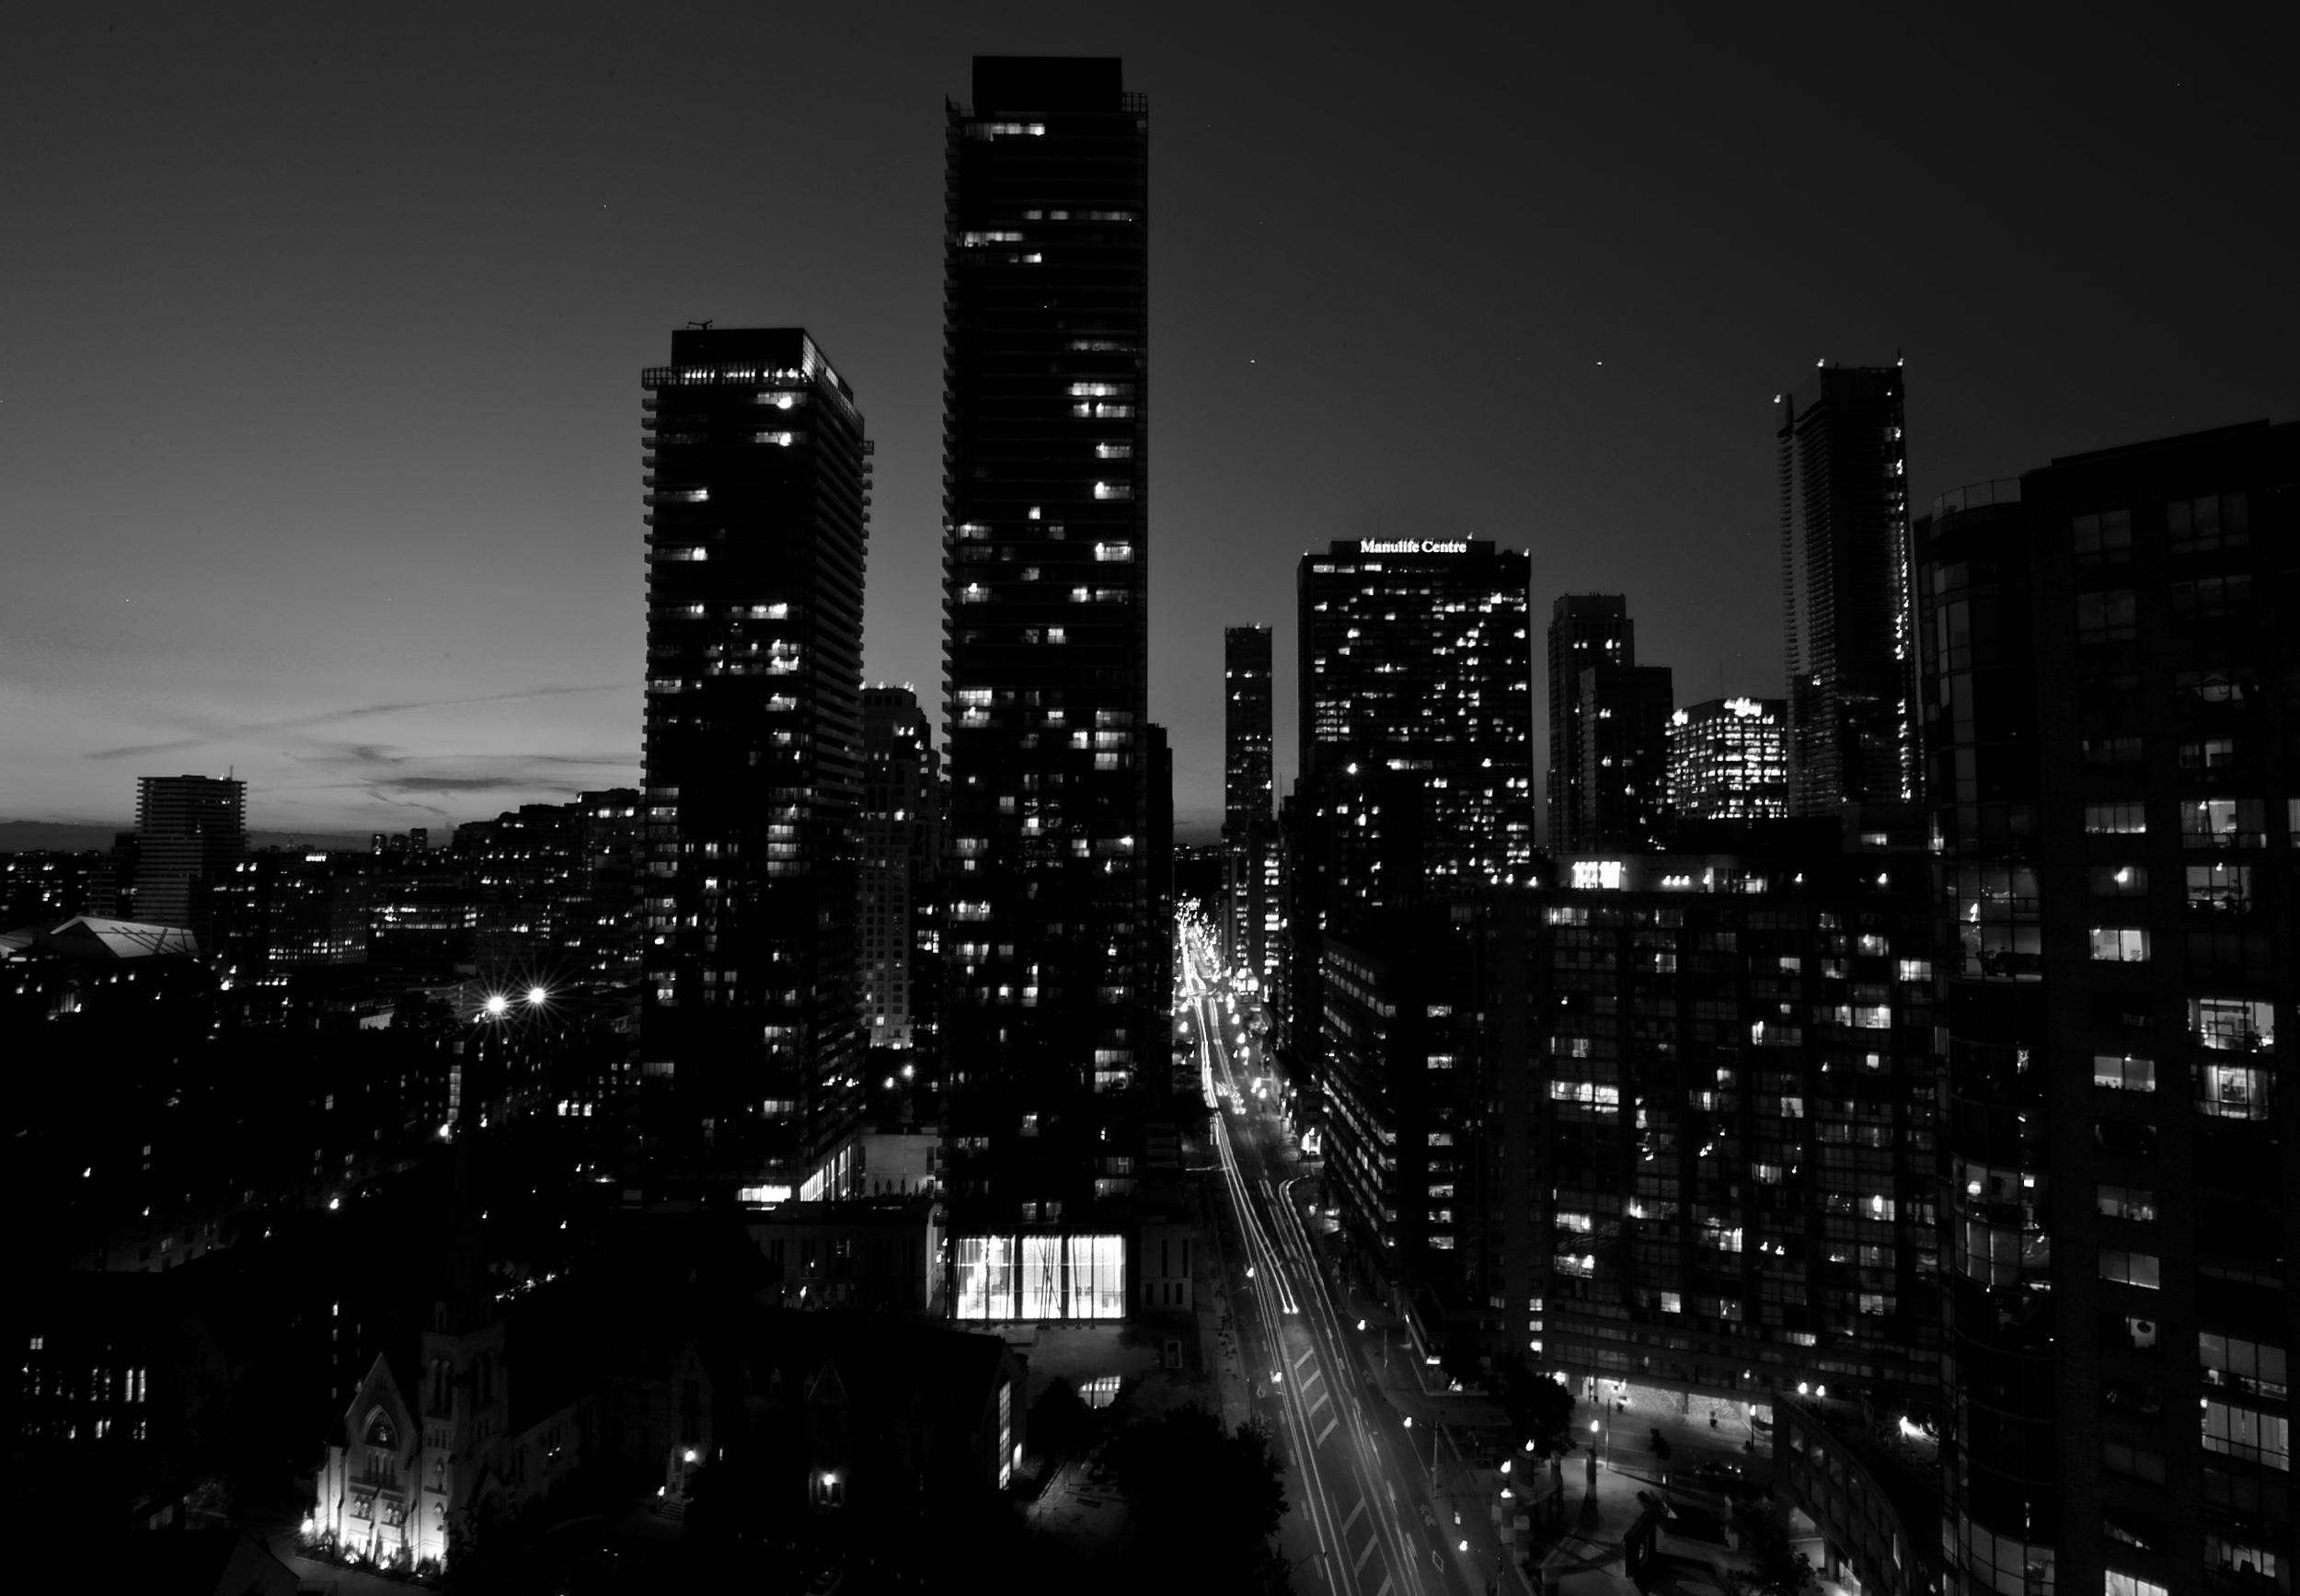 Toronto city scape at night.